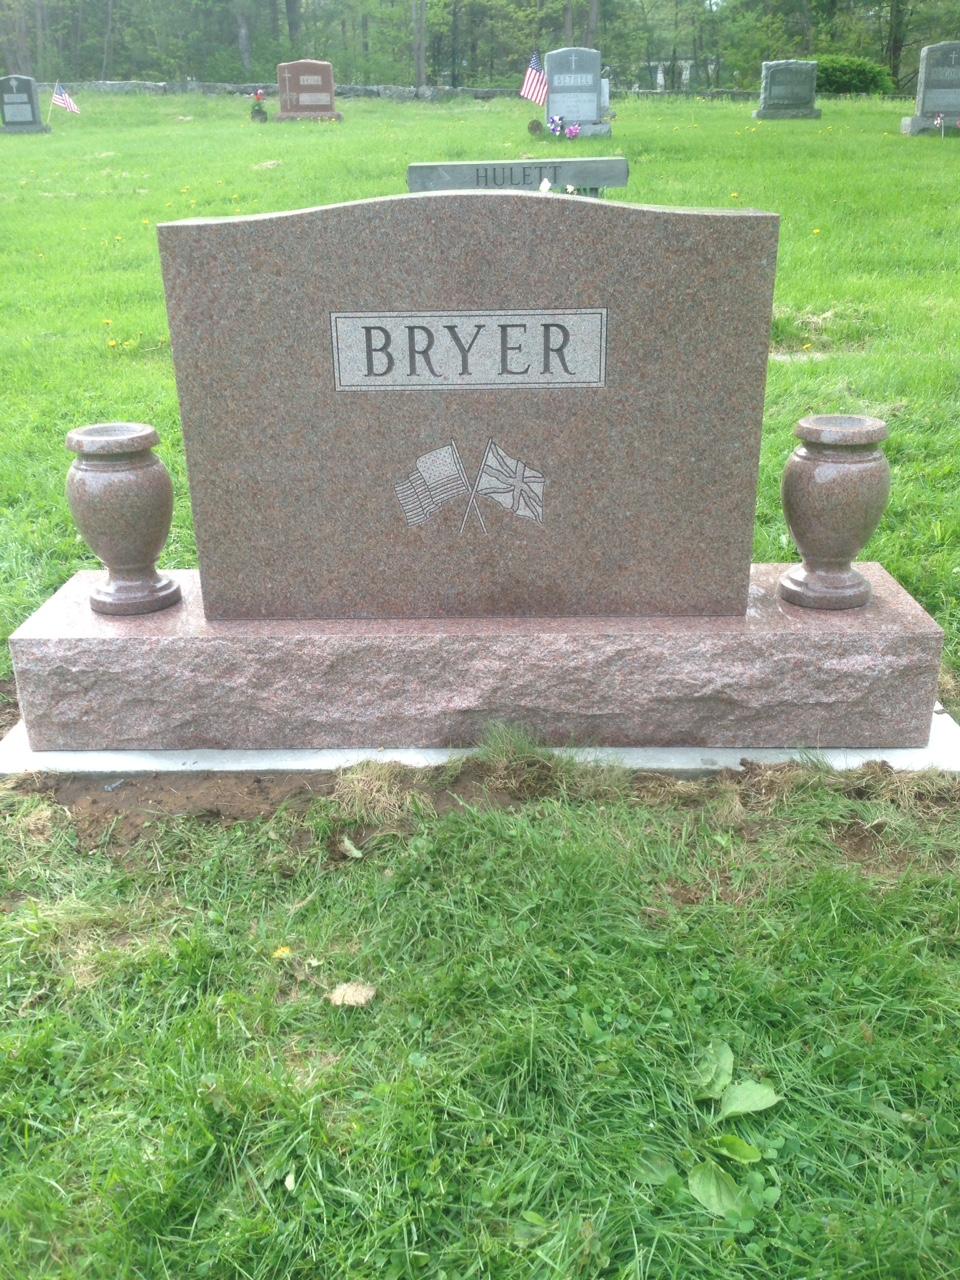 BRYER front.JPG